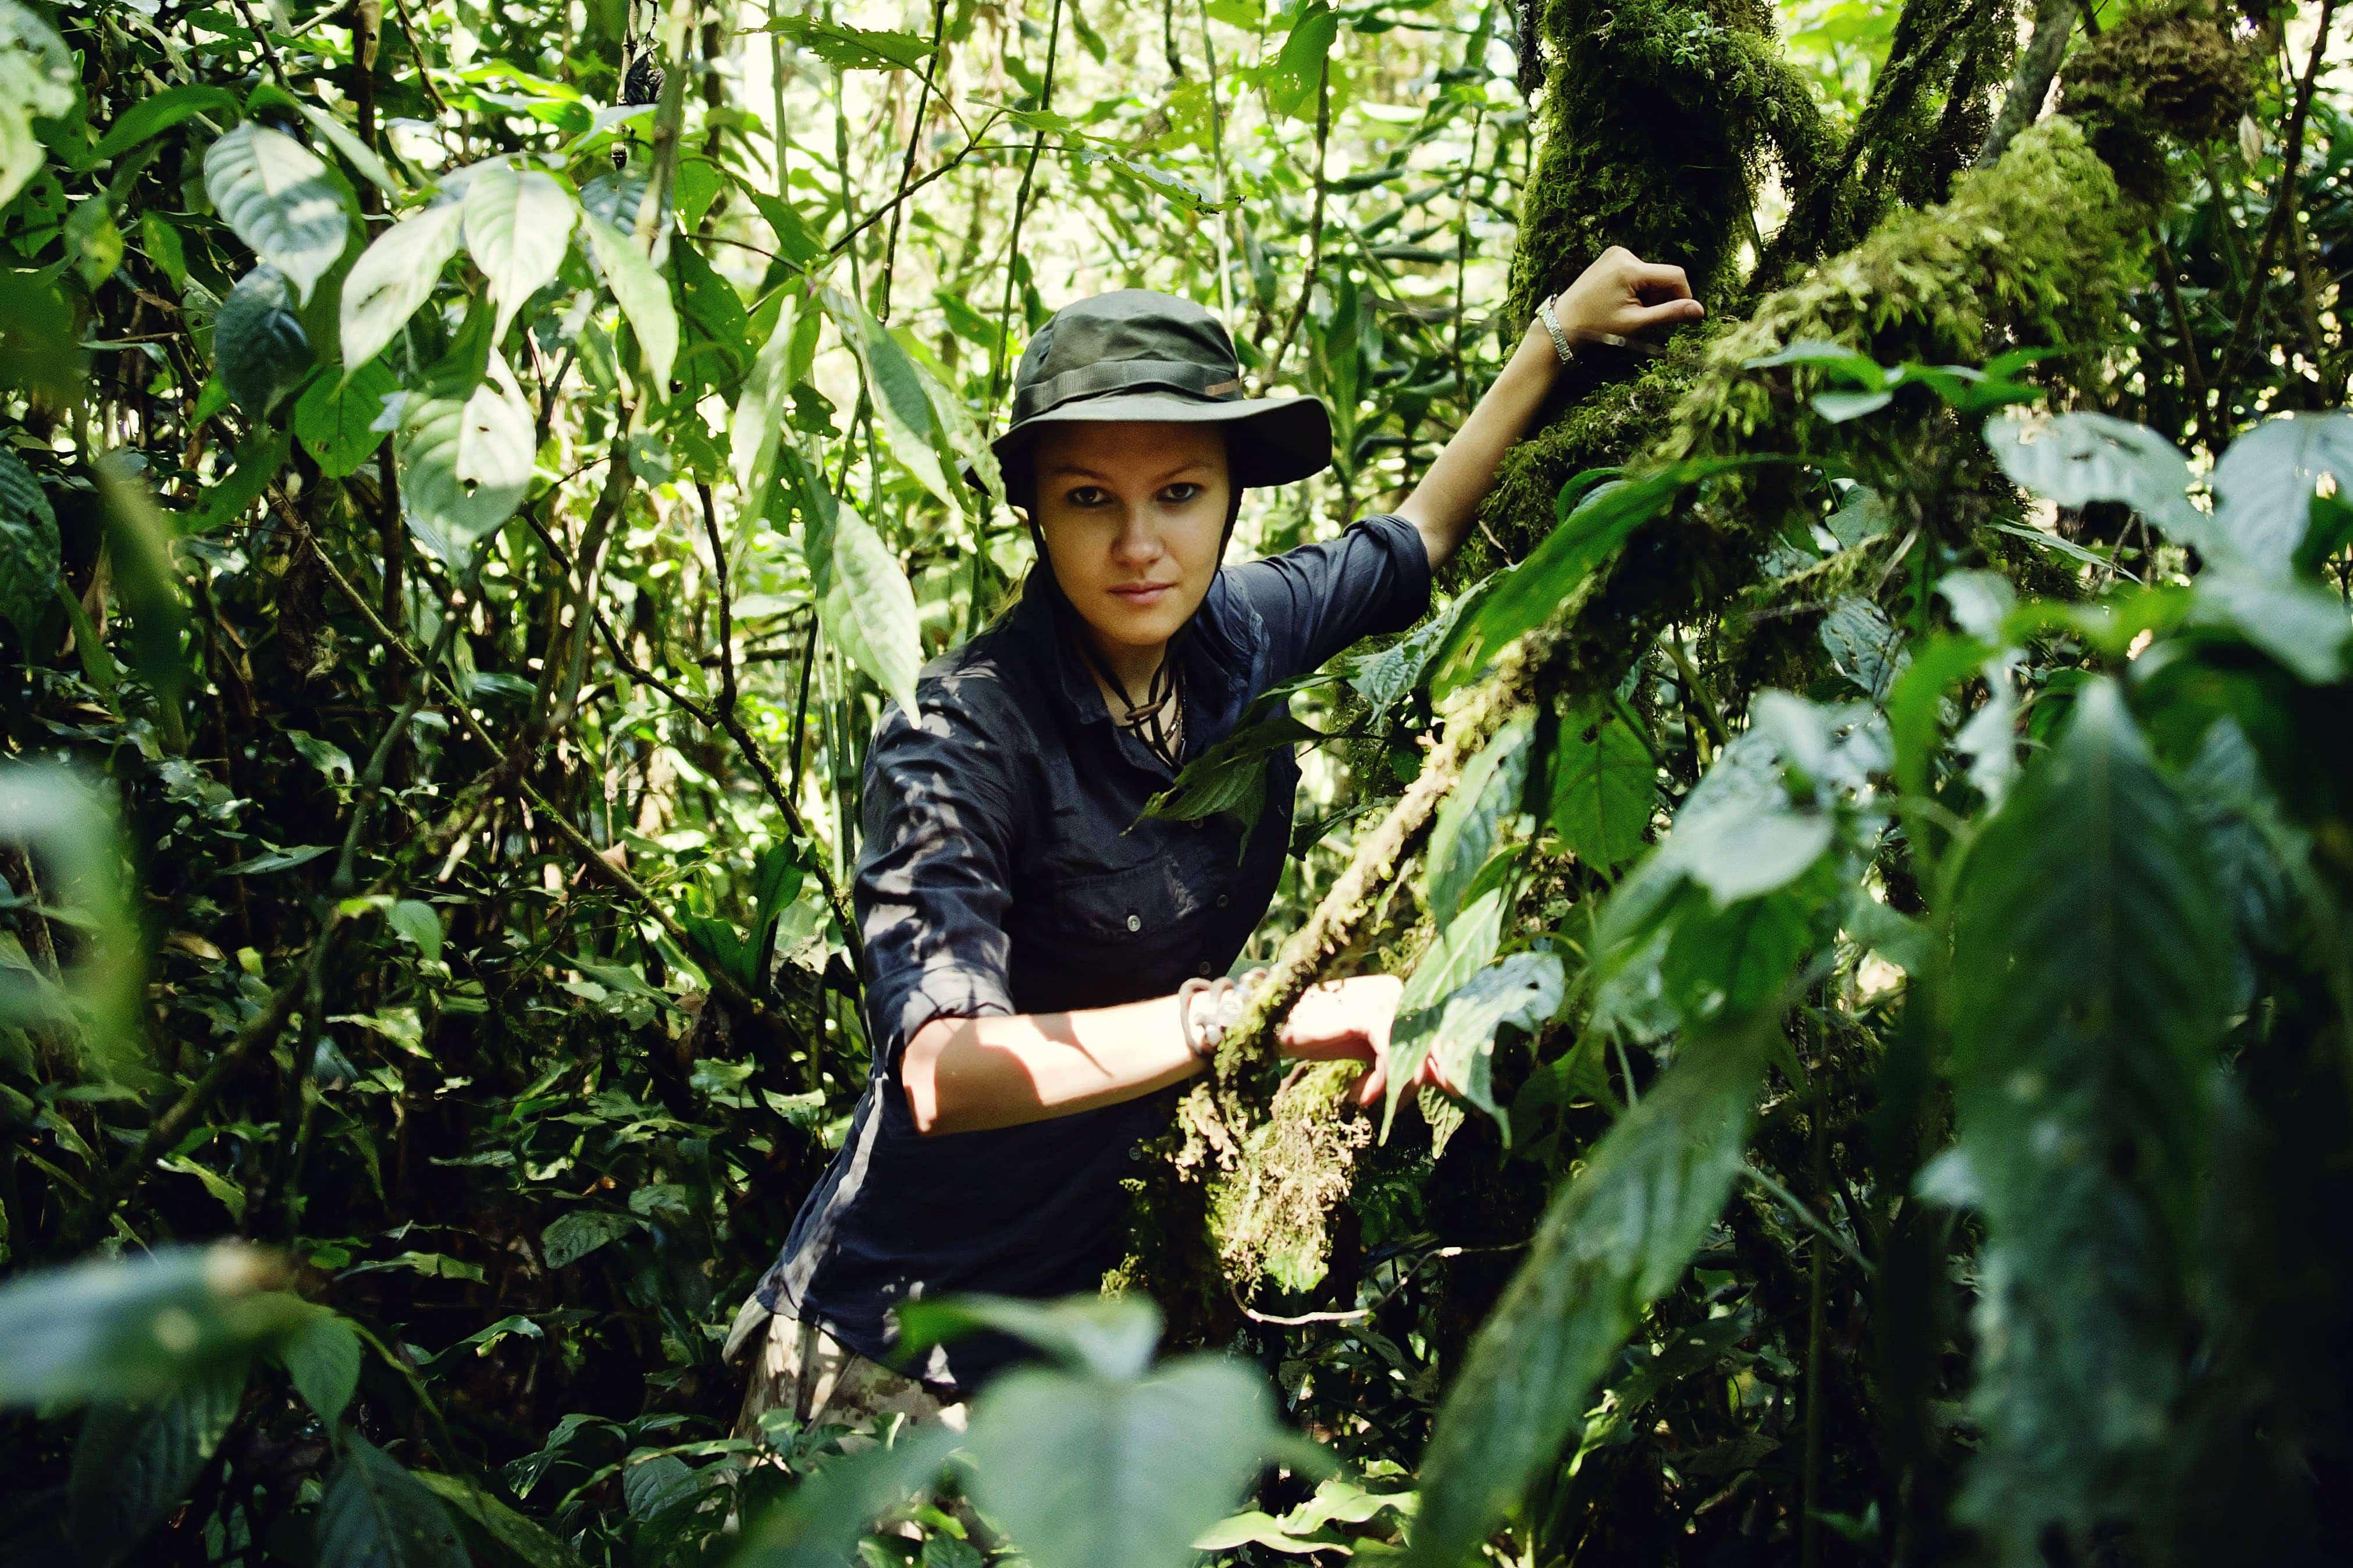 Dżungla Kakamega. Kenia, luty 2015.